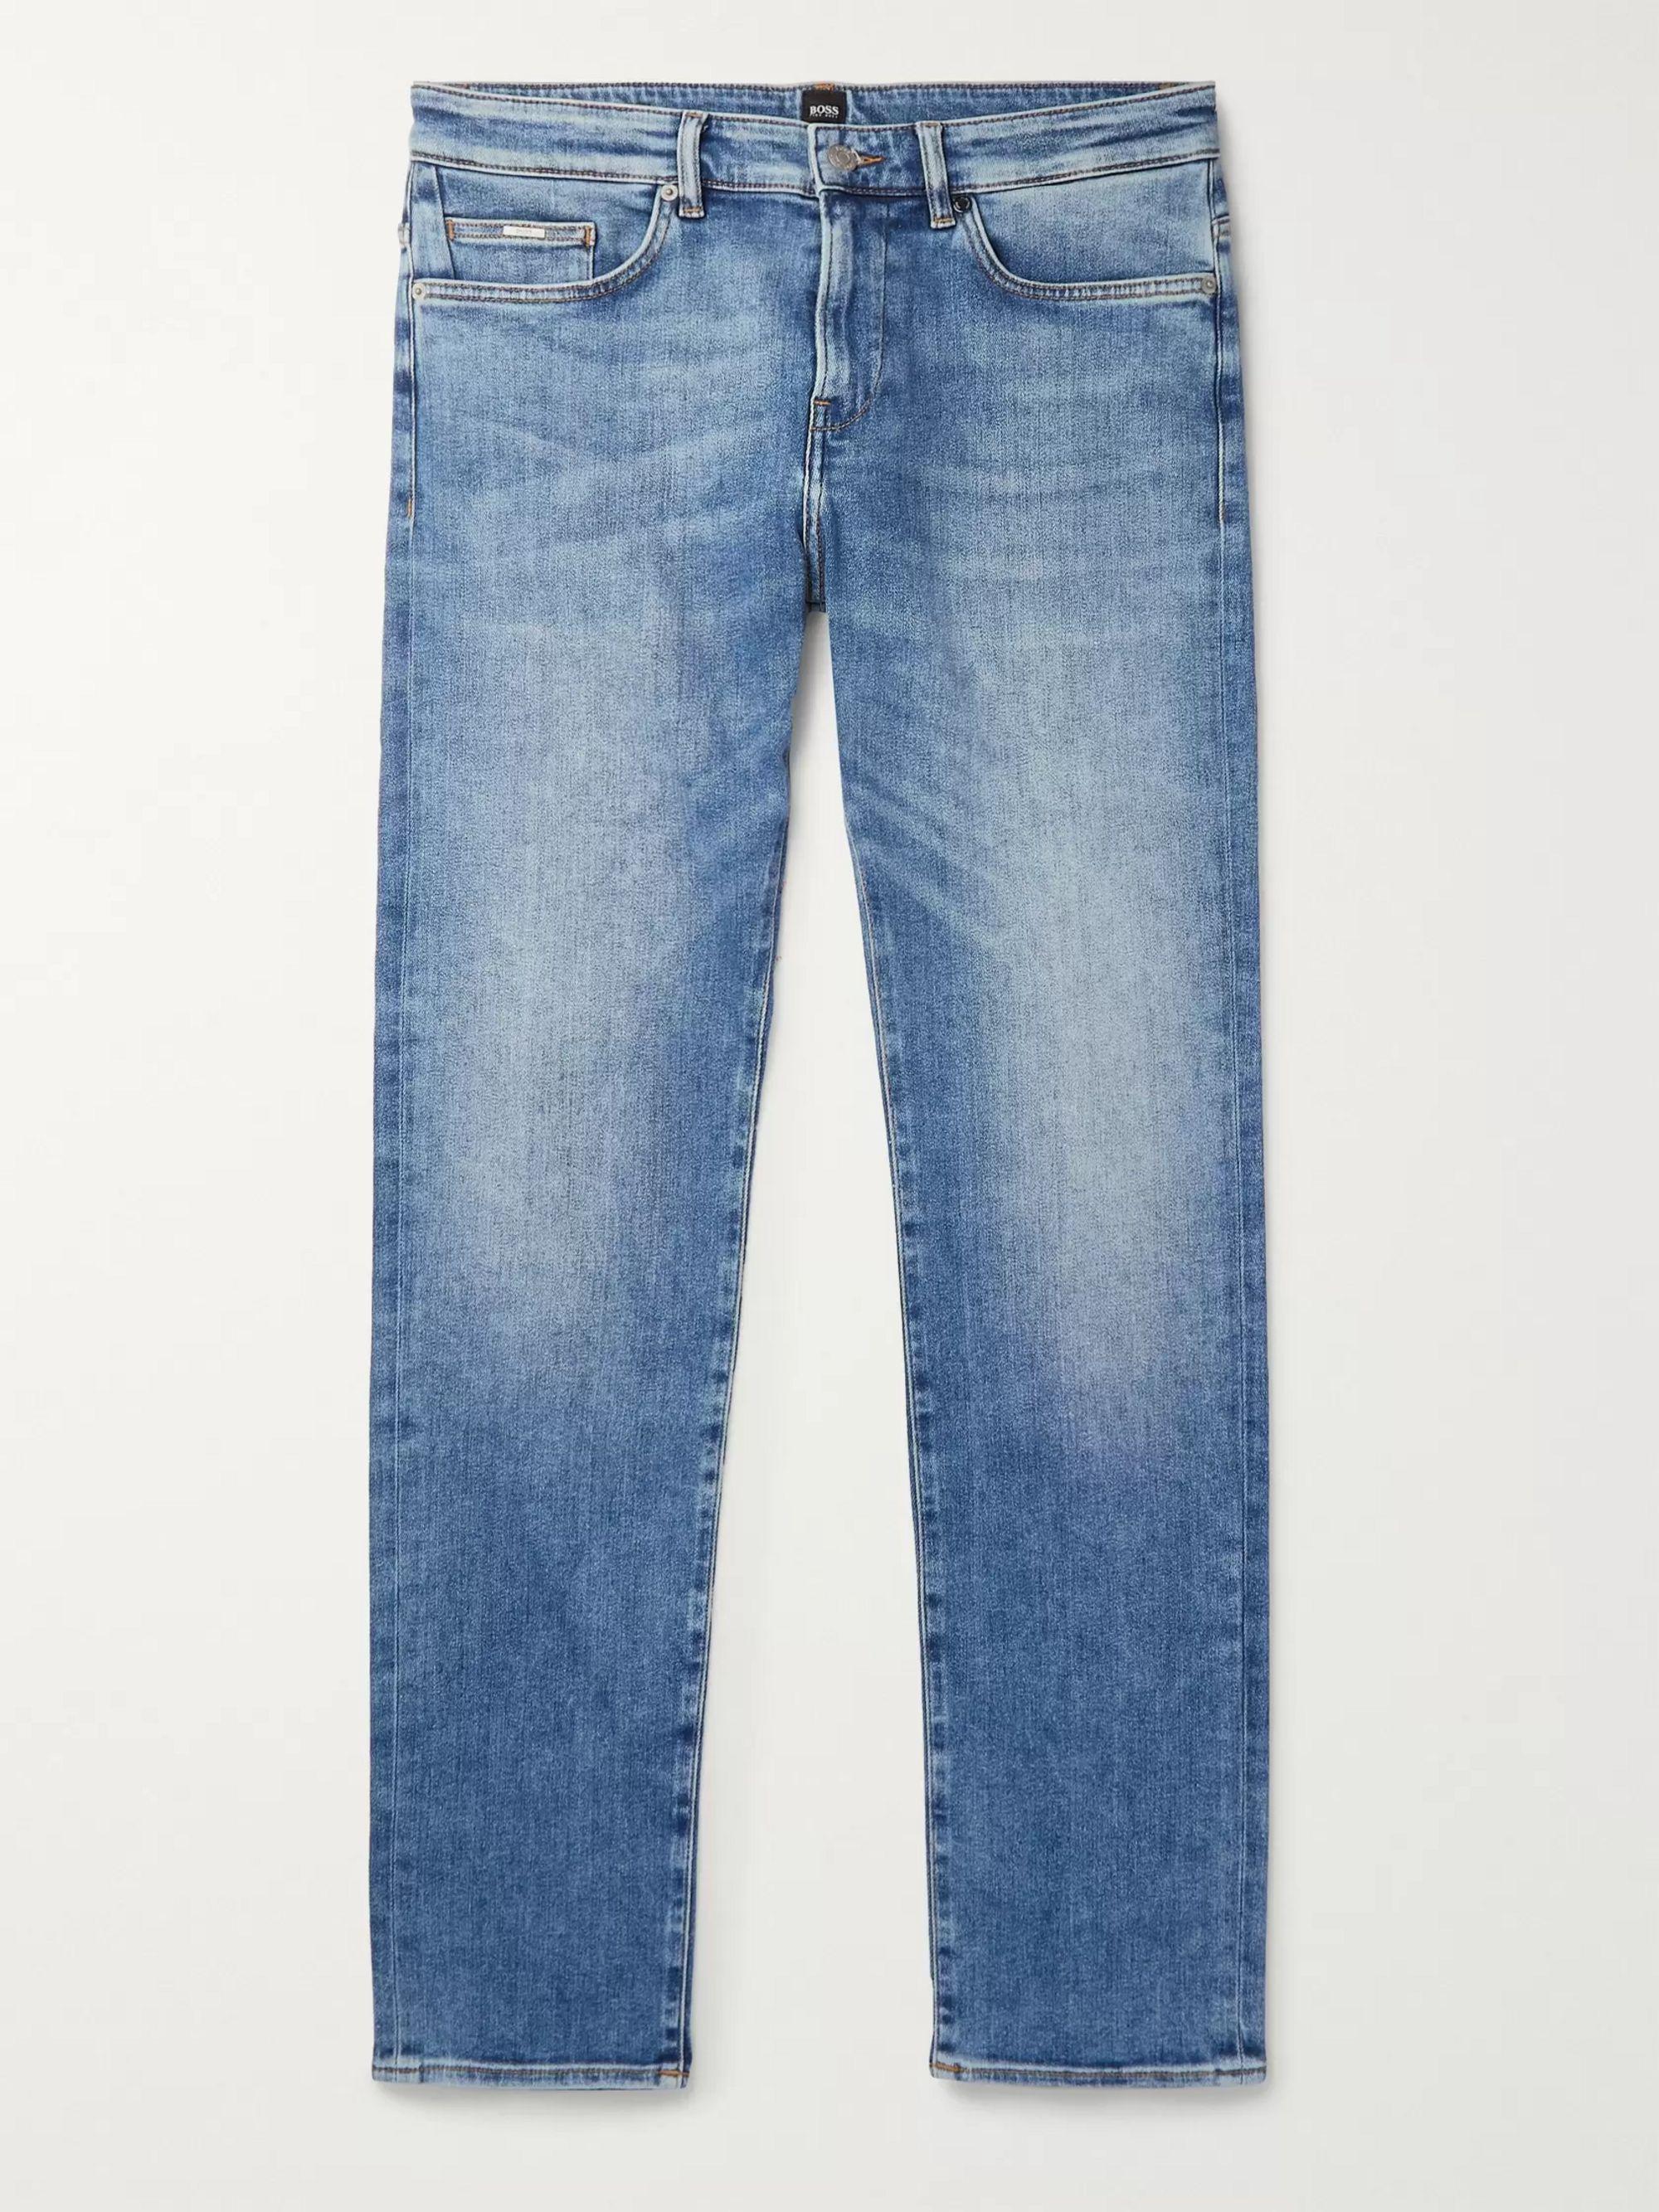 Hugo Boss Mid denim Delaware Slim-Fit Stretch-Denim Jeans,Mid denim